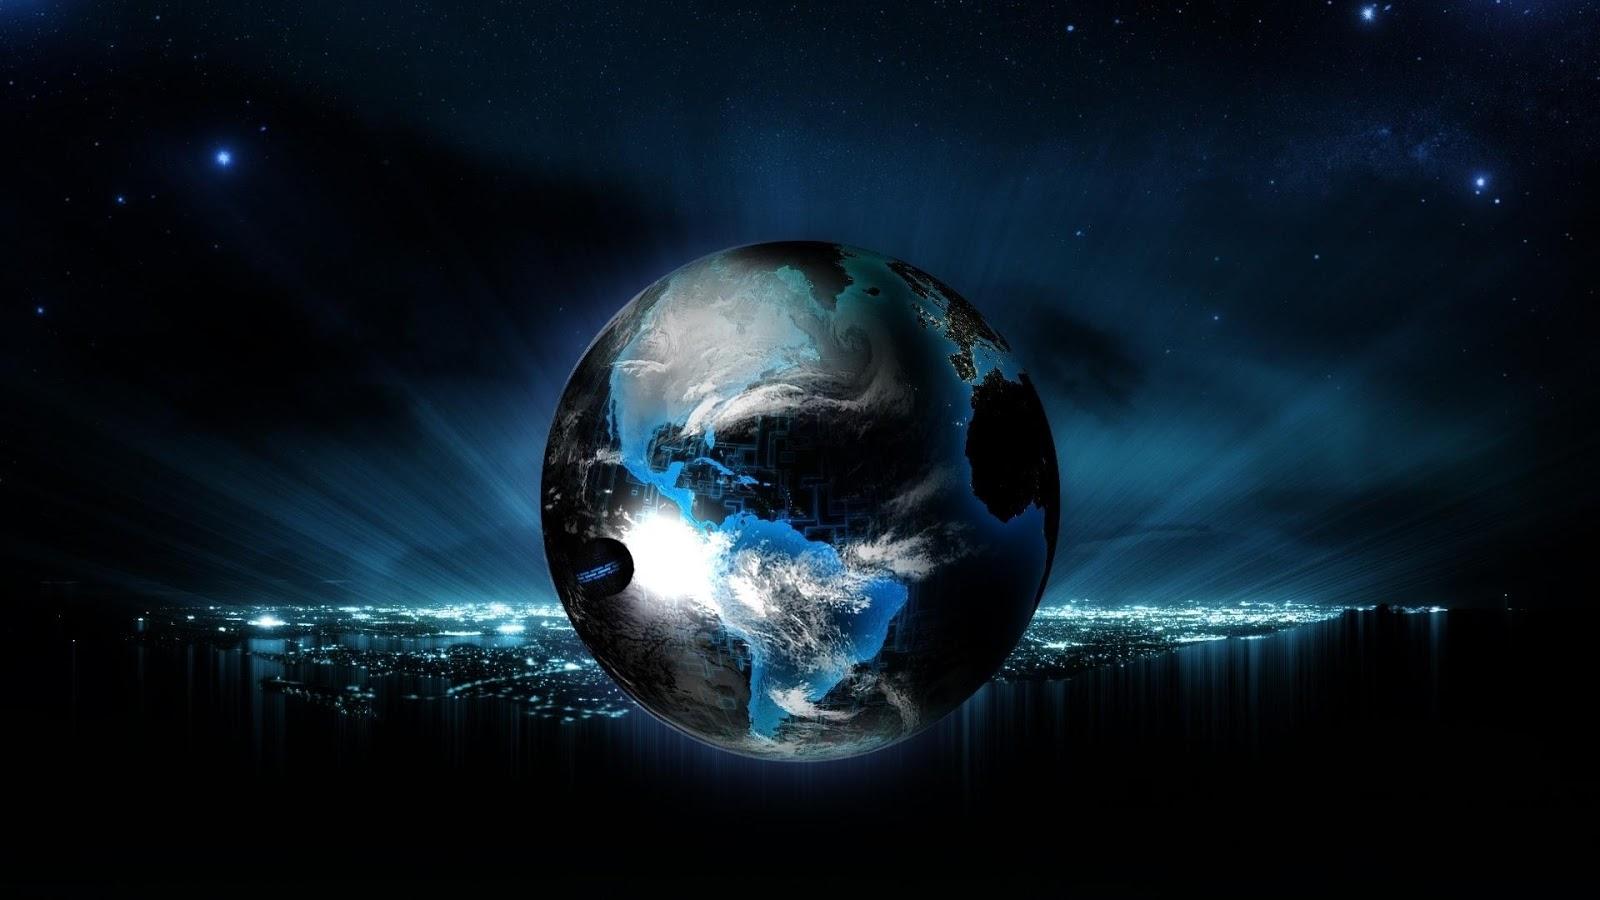 earth wallpaper hd 1080p - photo #25